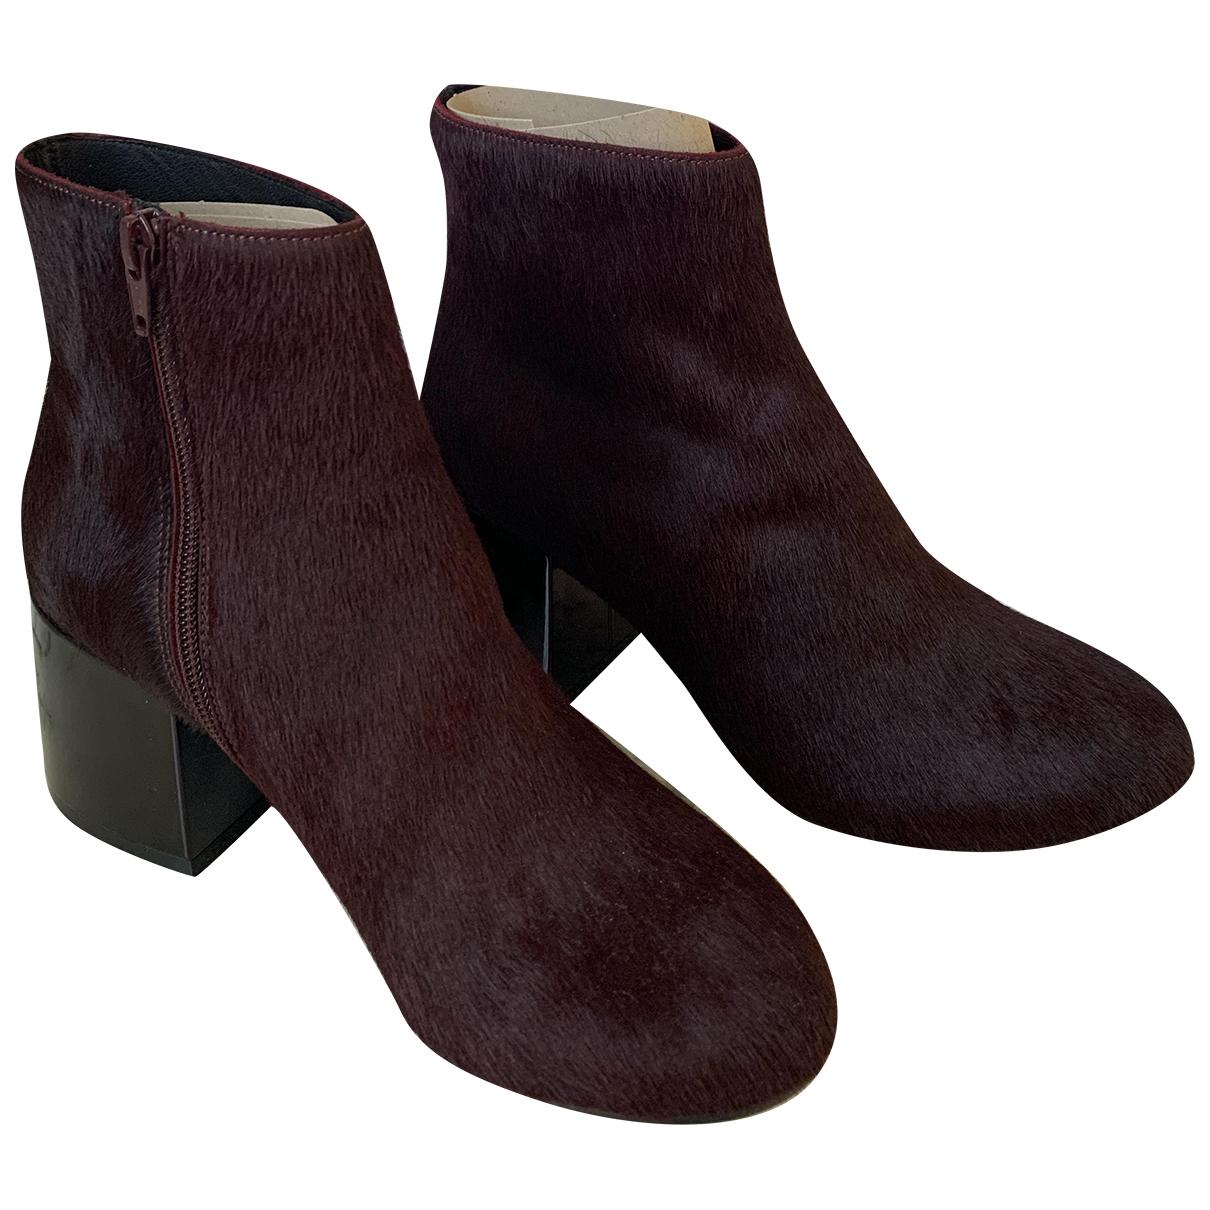 Maison Martin Margiela \N Burgundy Pony-style calfskin Ankle boots for Women 38.5 EU